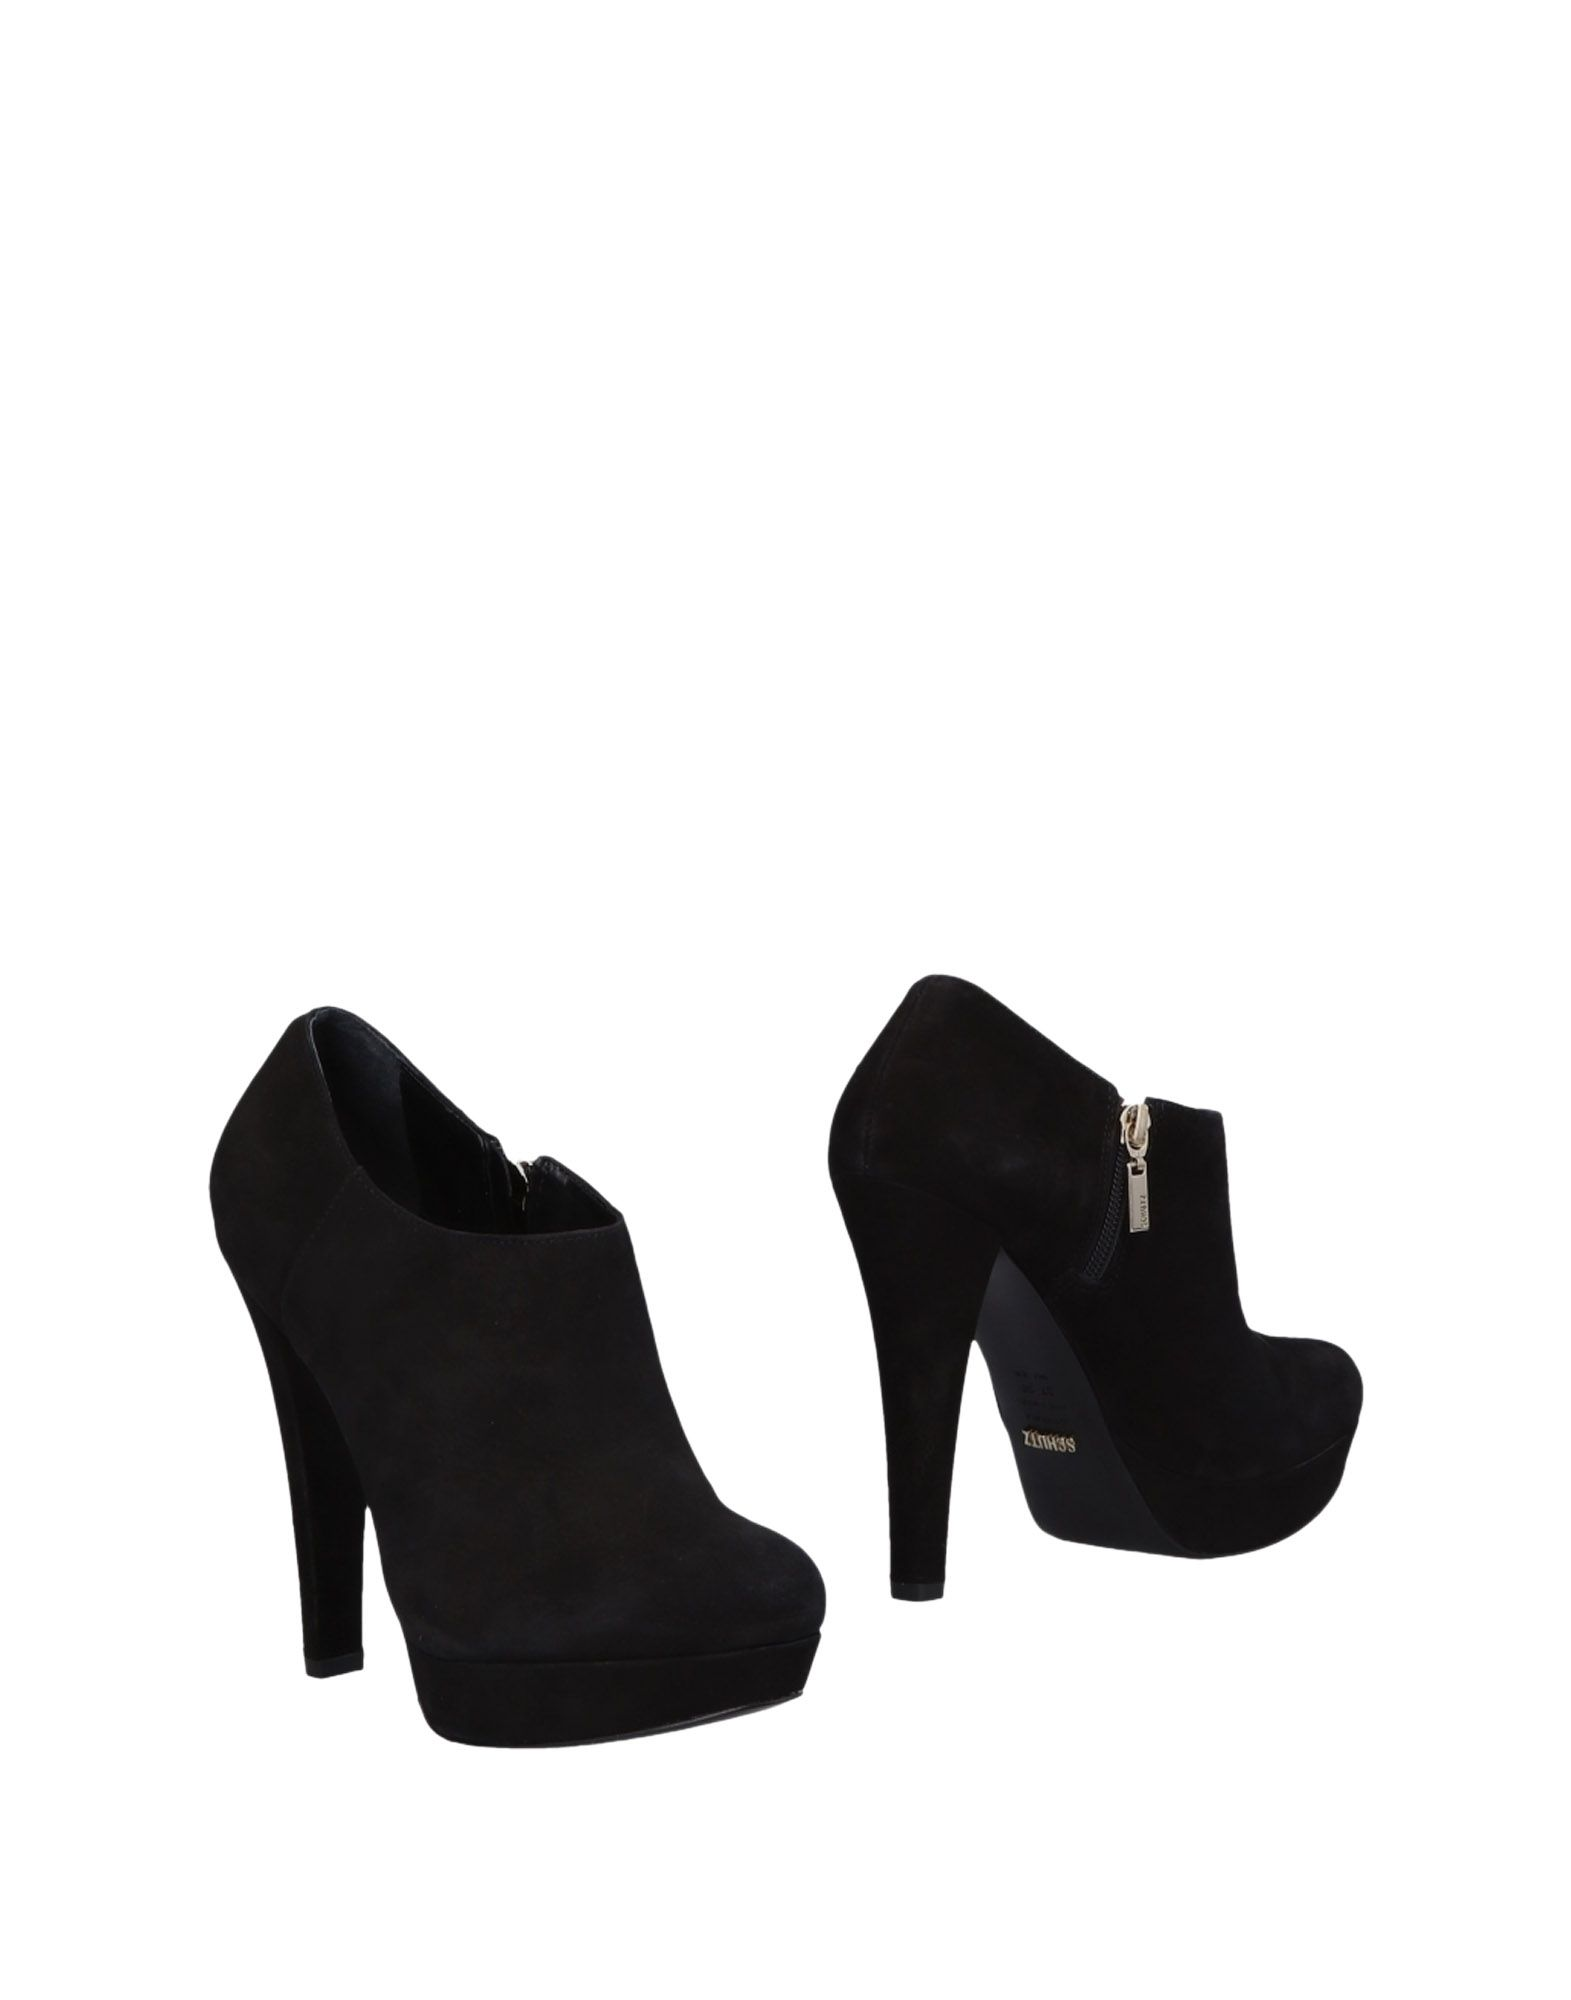 Schutz Ankle Boot - Women Schutz Ankle Australia Boots online on  Australia Ankle - 11477776EL 31c666